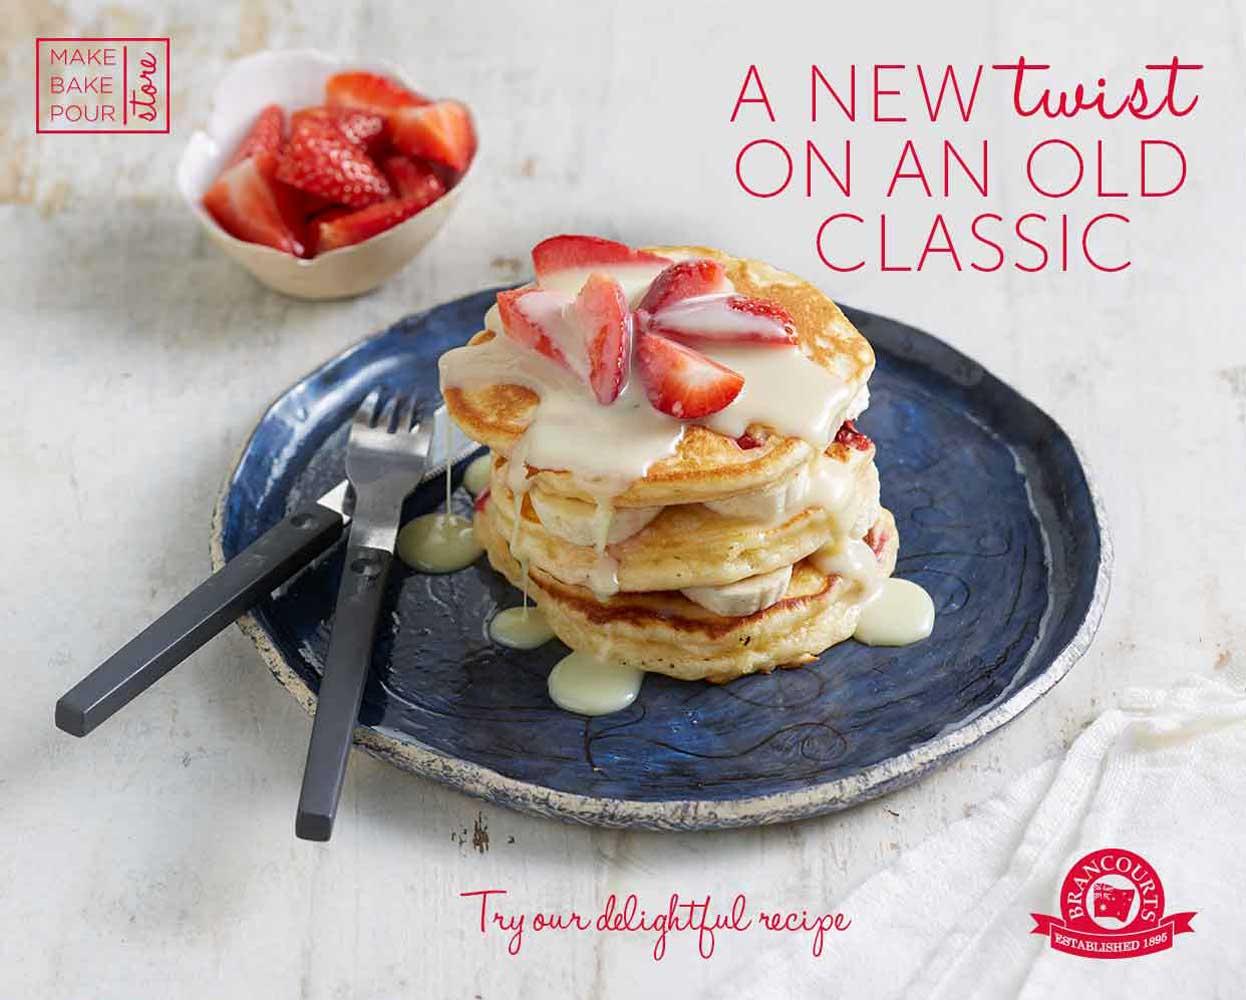 Brancourts retail campaign branding pancakes